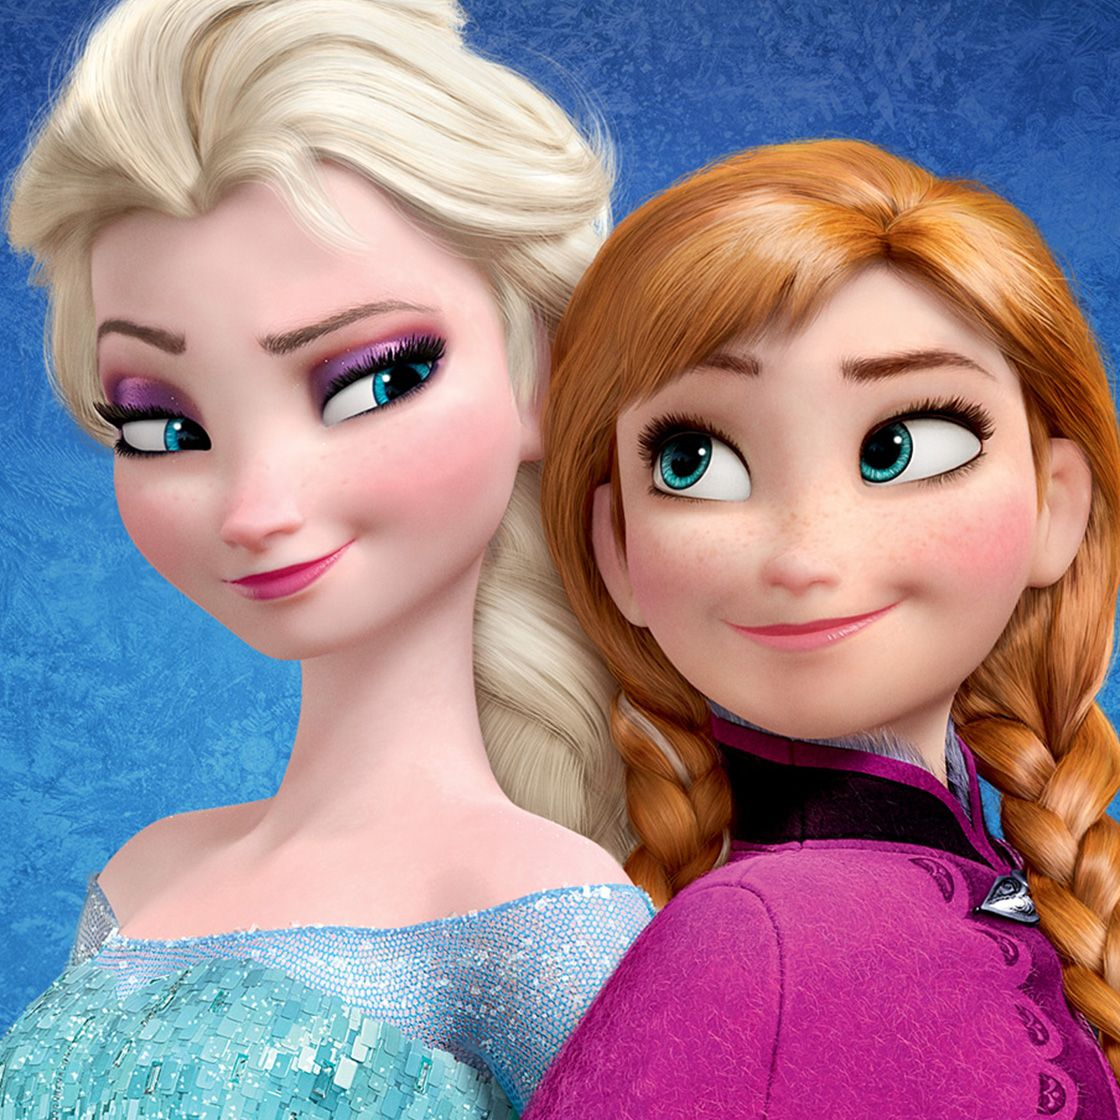 Sex disney prinzessinnen Two Disney